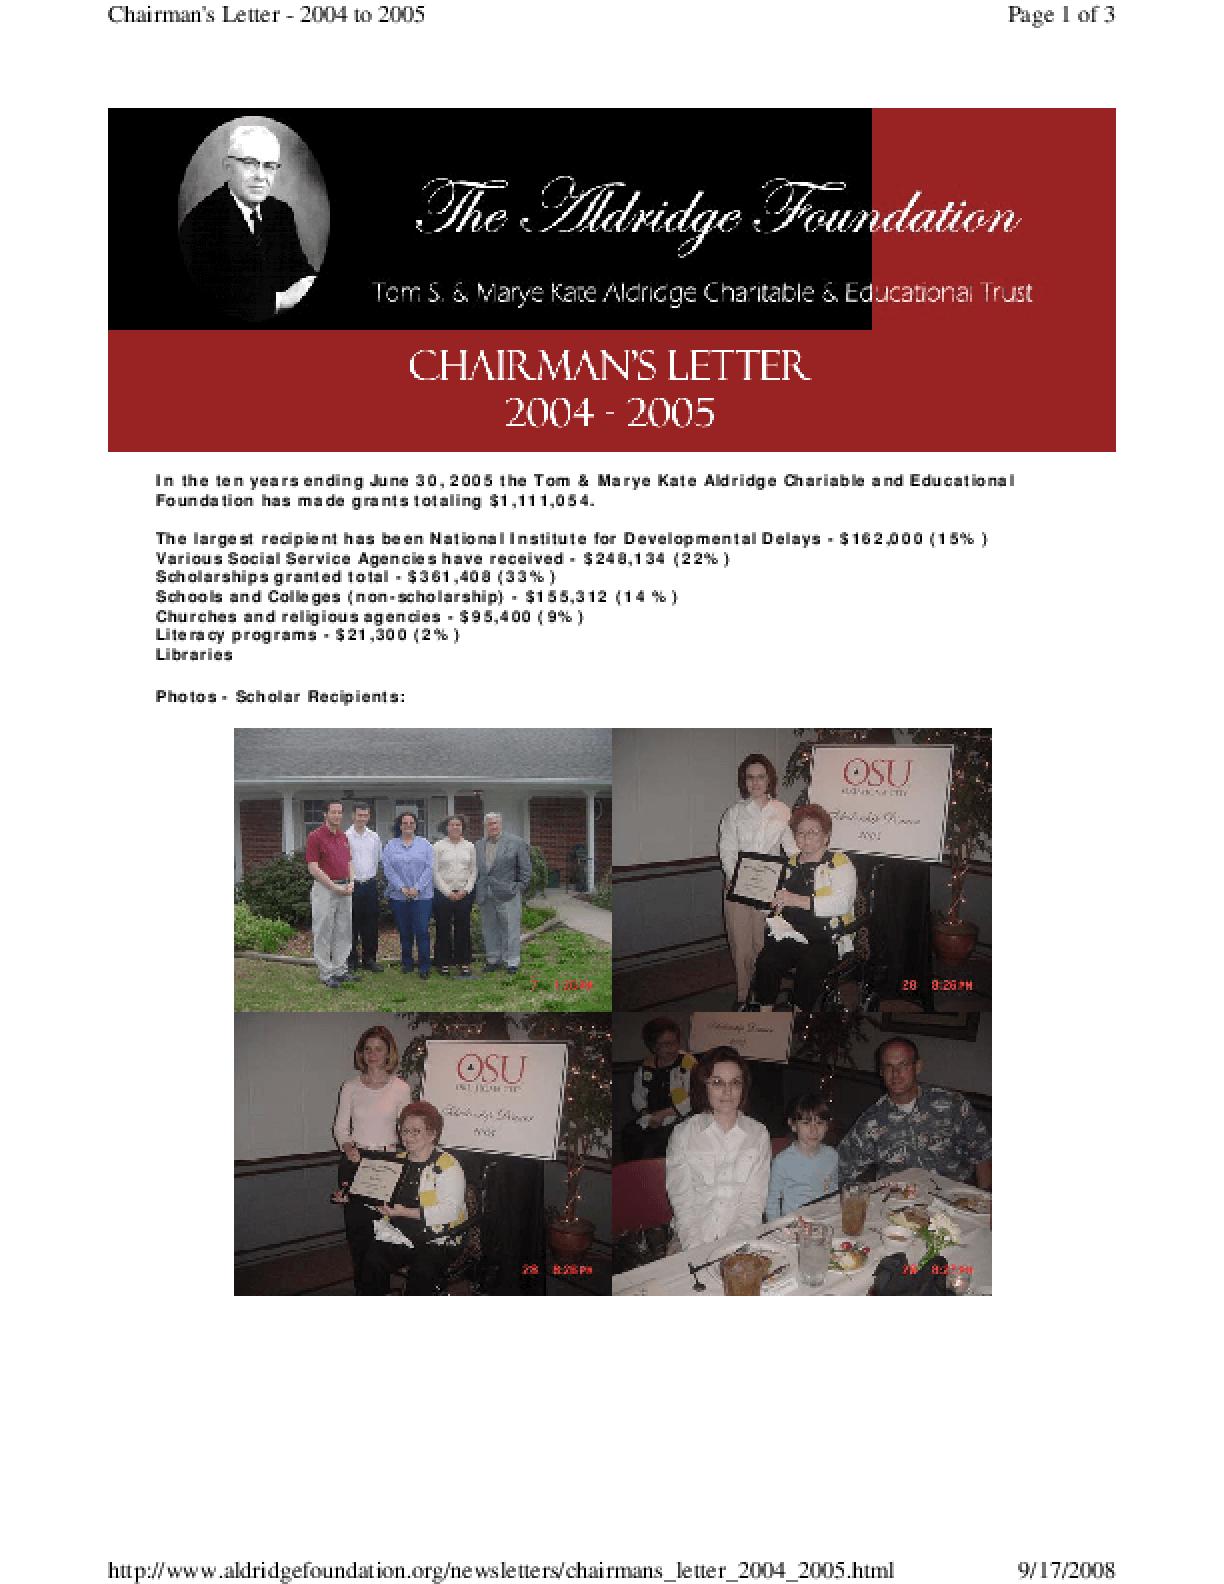 Tom S. and Marye Kate Aldridge Charitable & Educational Trust - 2004-2005 Annual Report